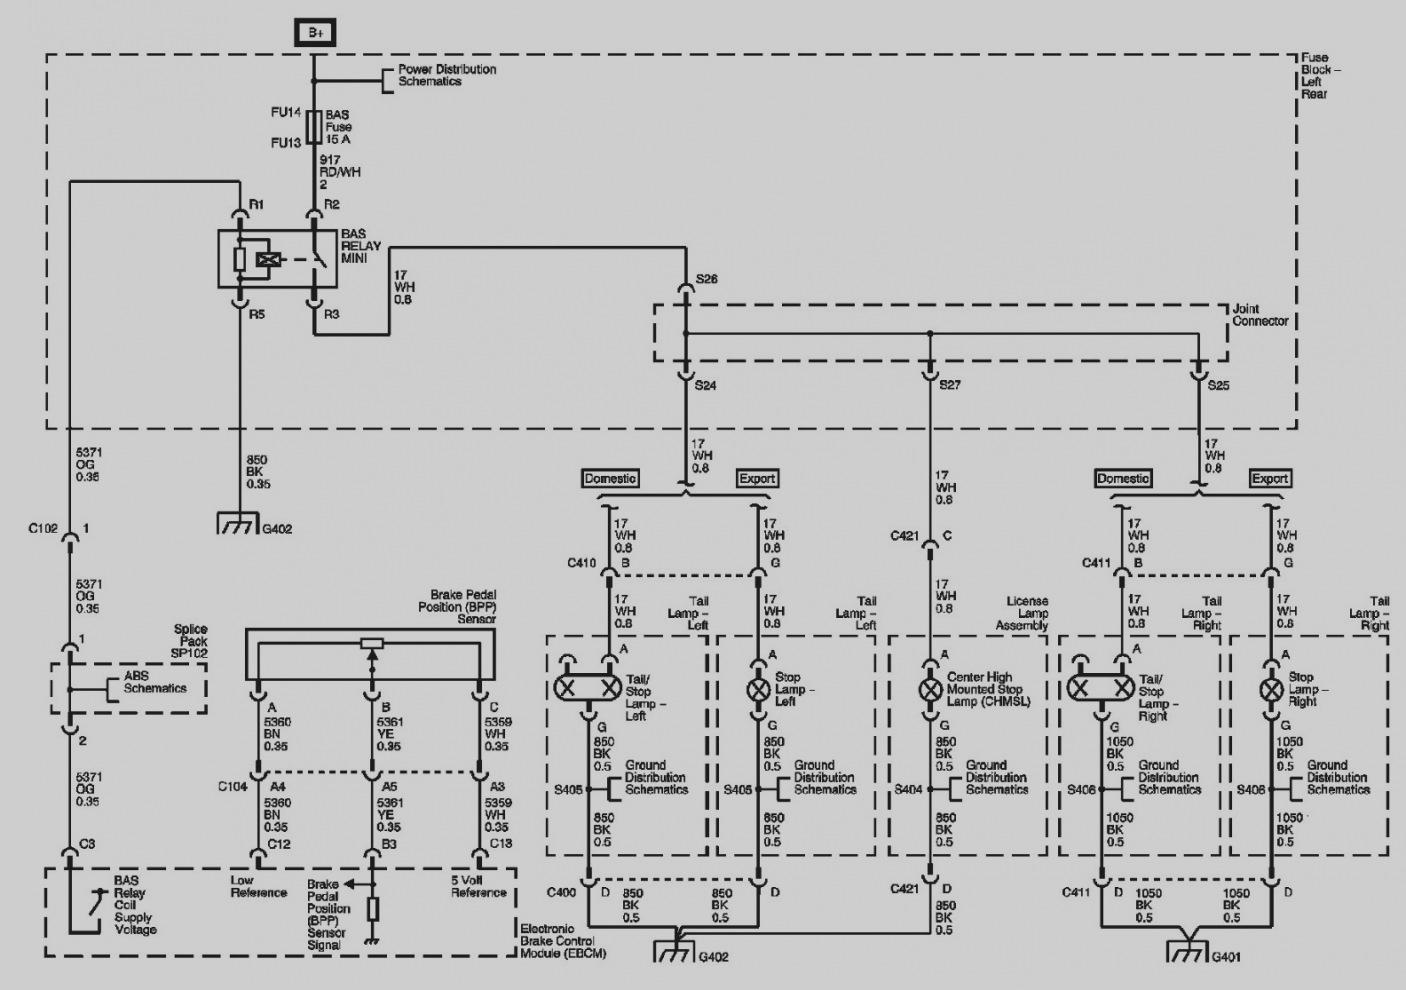 Cadillac Cts Radio Wiring Diagram Free Download 2002 Cadillac Deville Factory Amp Wiring Diagram Free